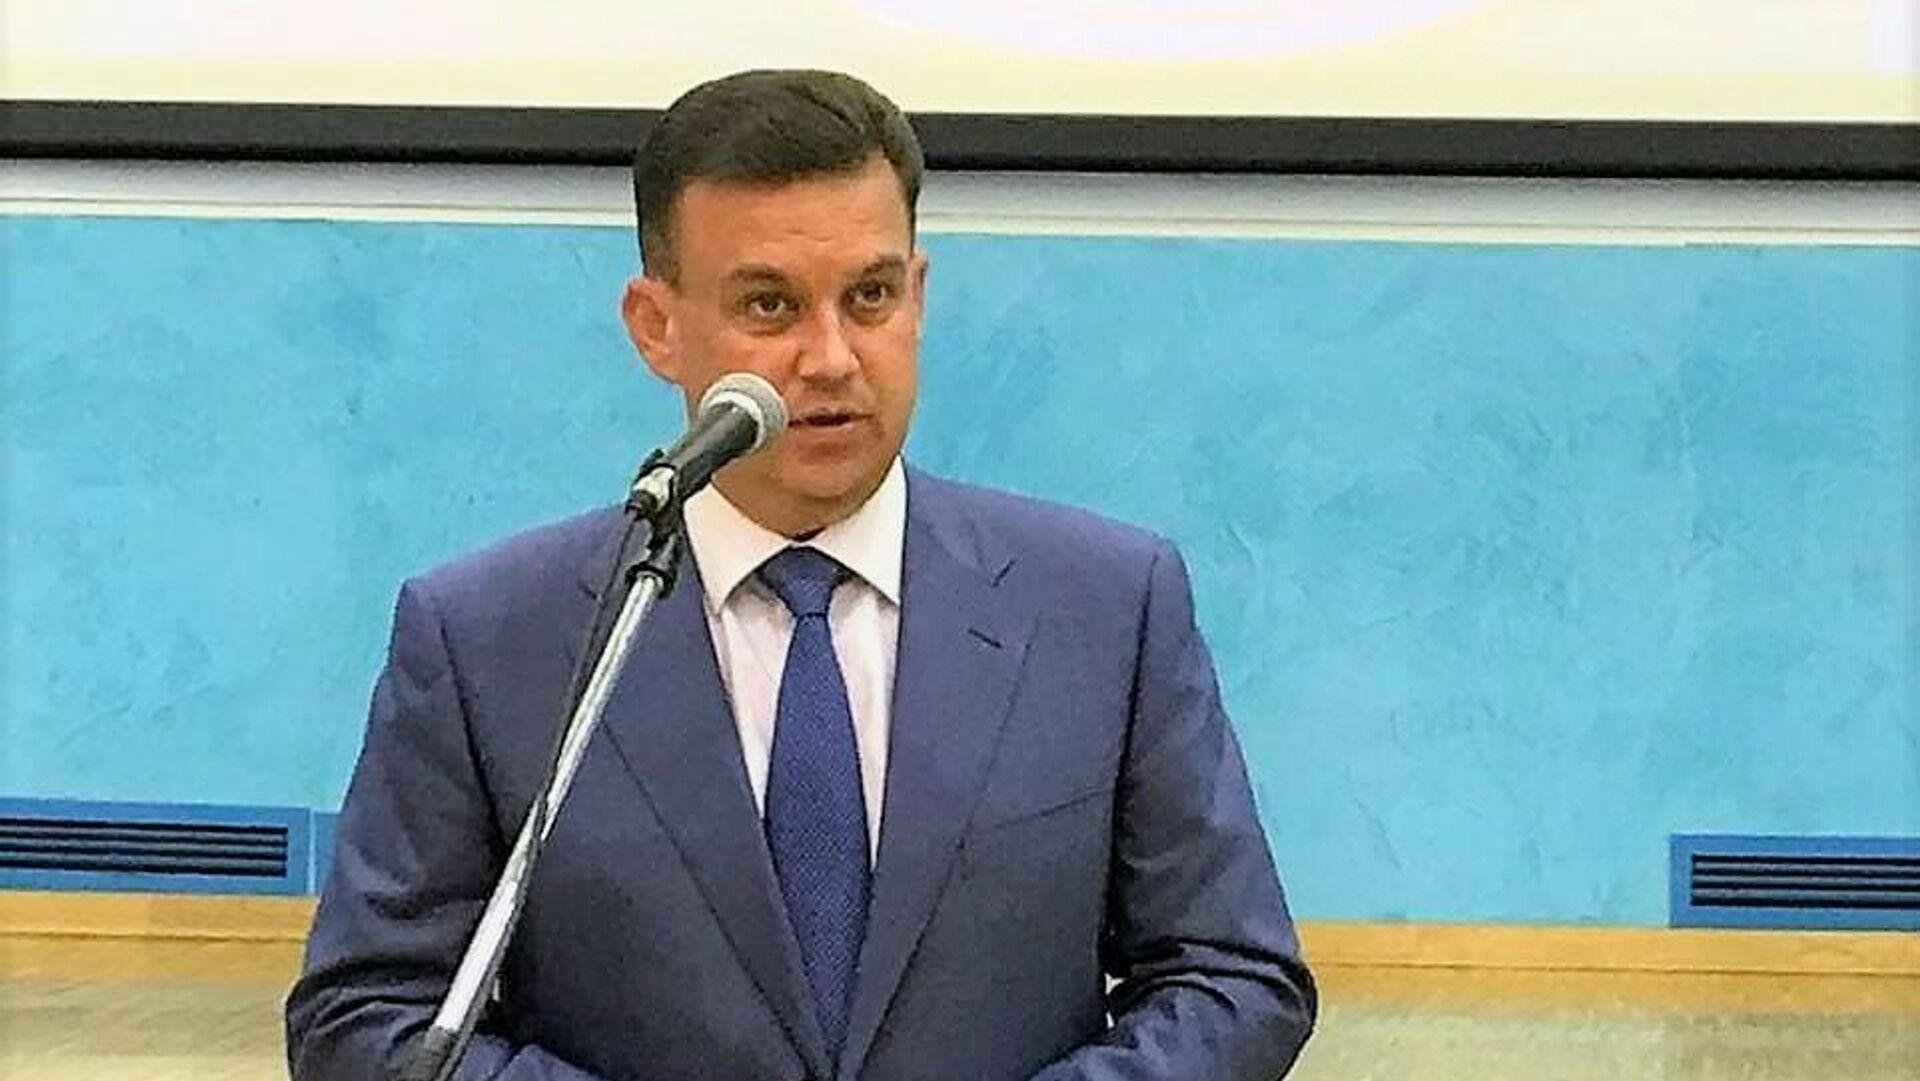 Мэра Кривого Рога нашли мертвым - РИА Новости, 16.08.2021